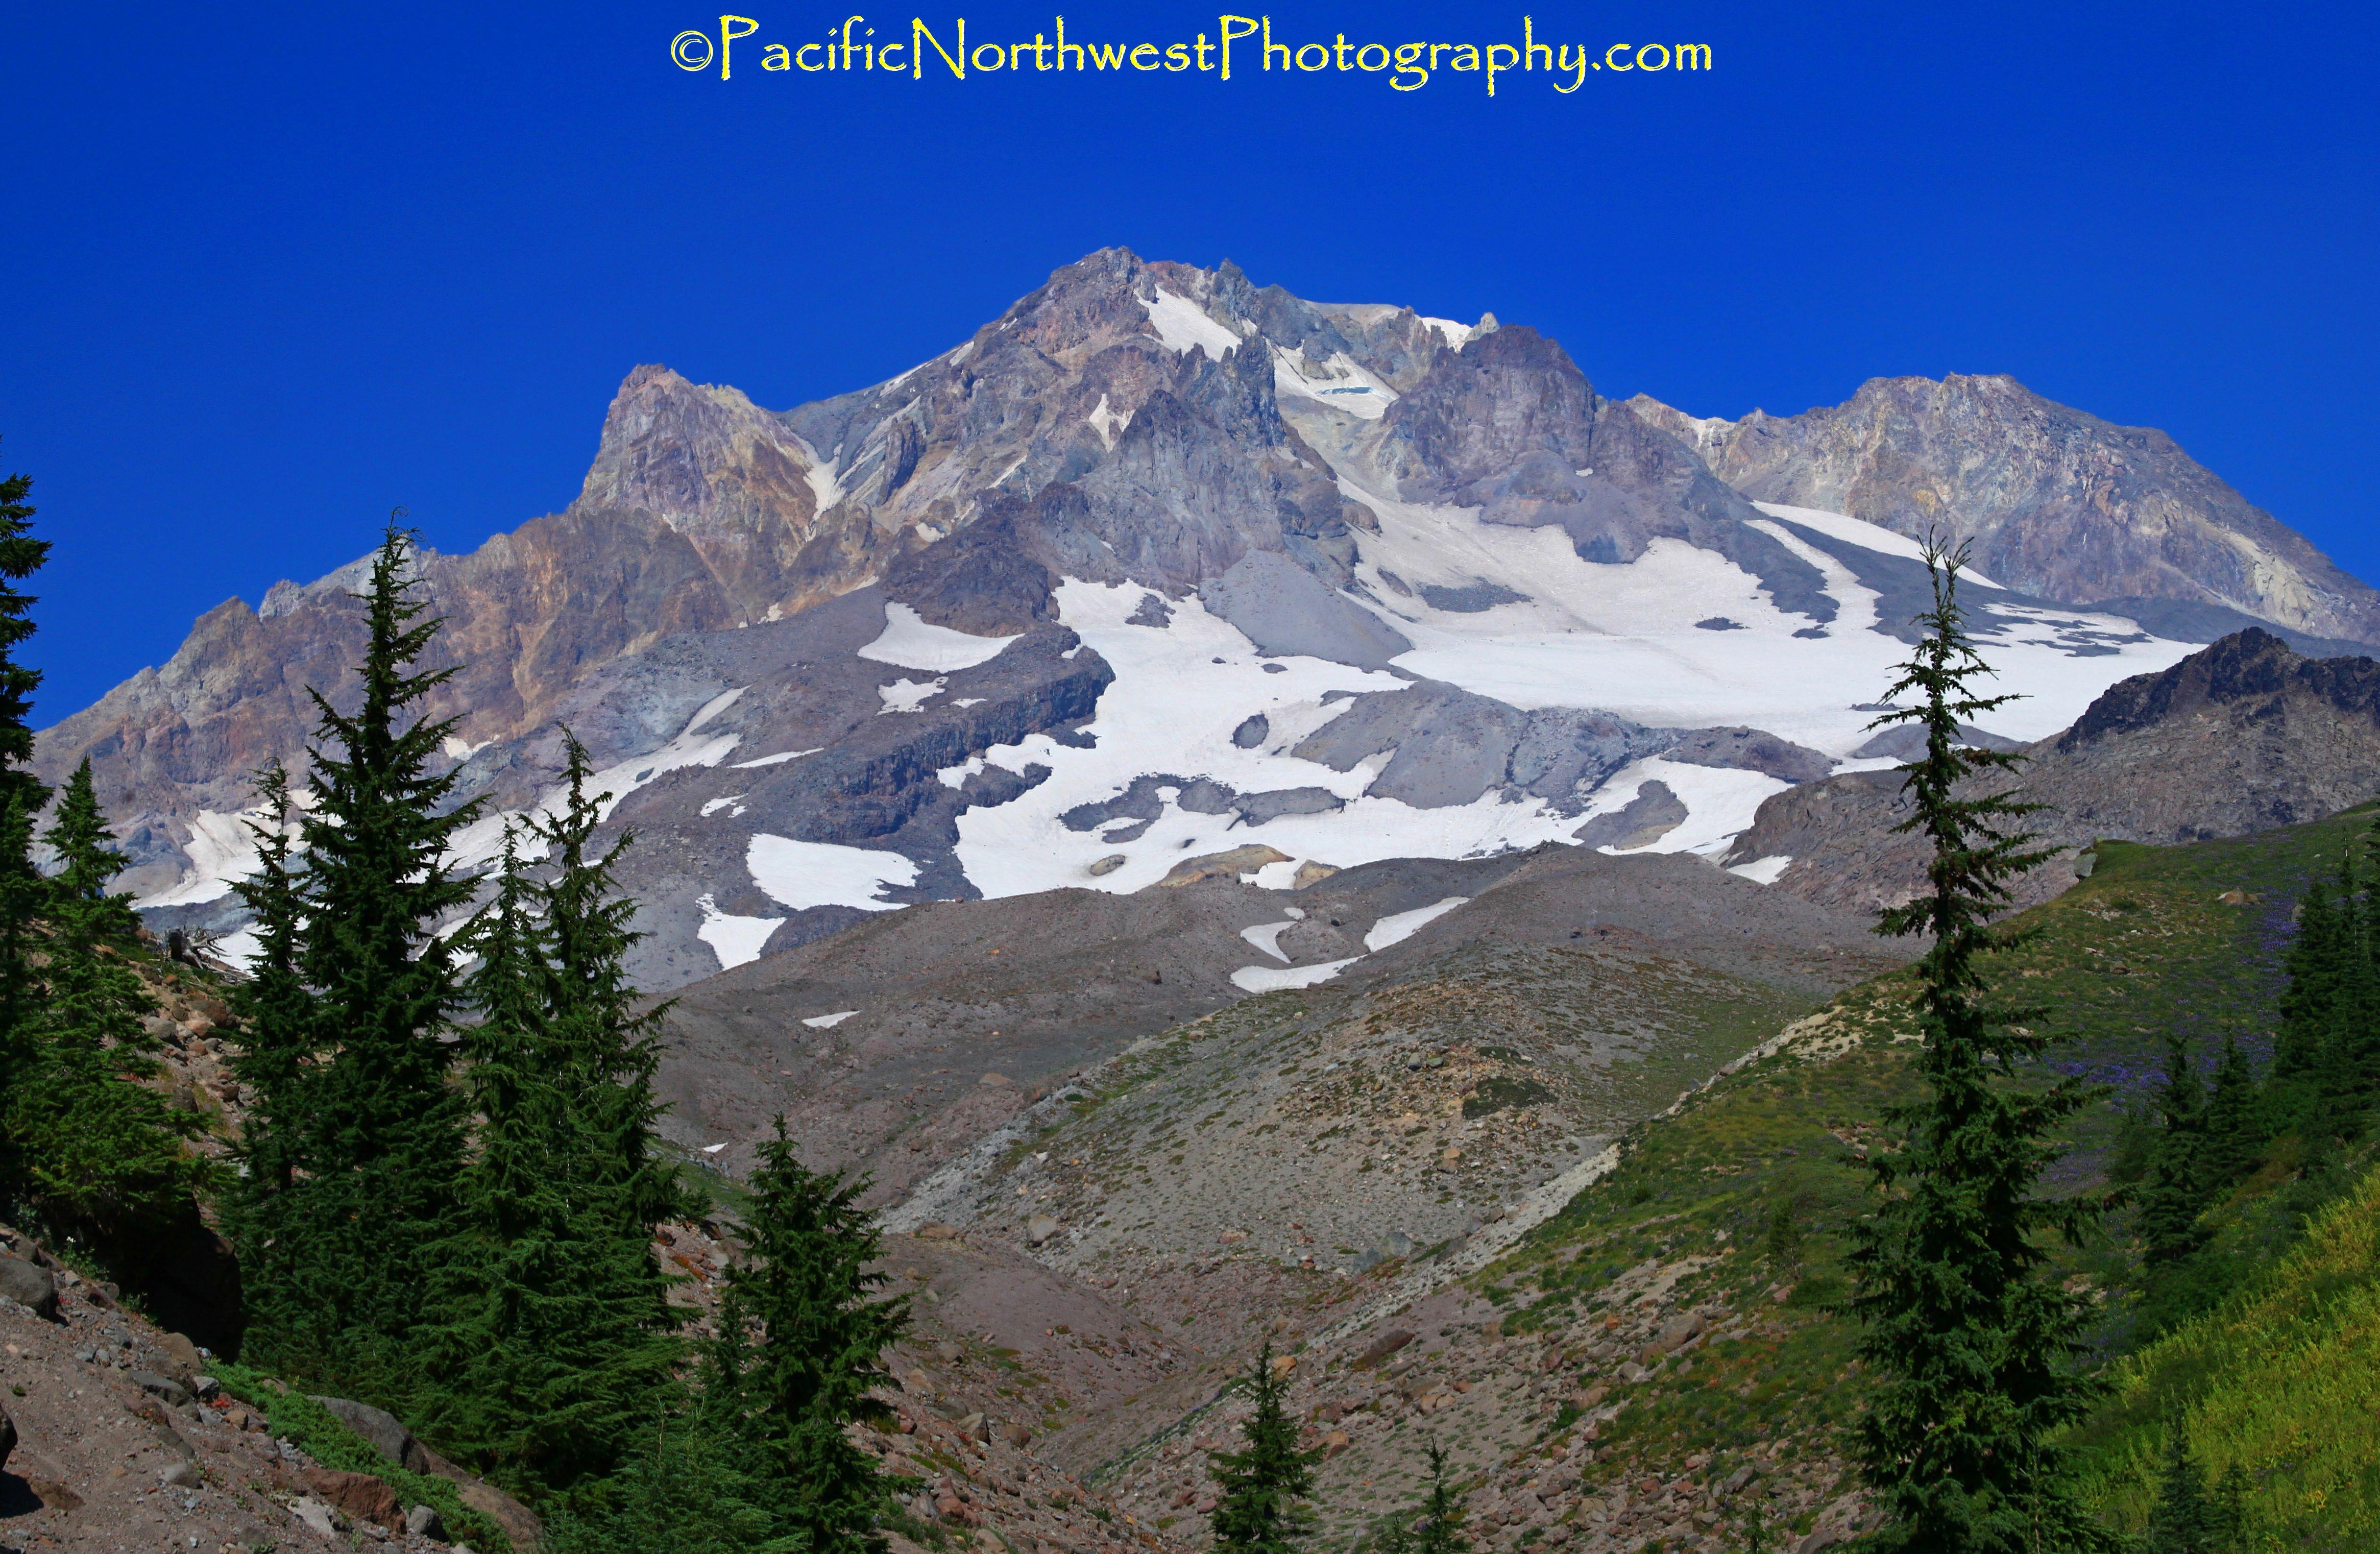 Mt. Hood, Oregon